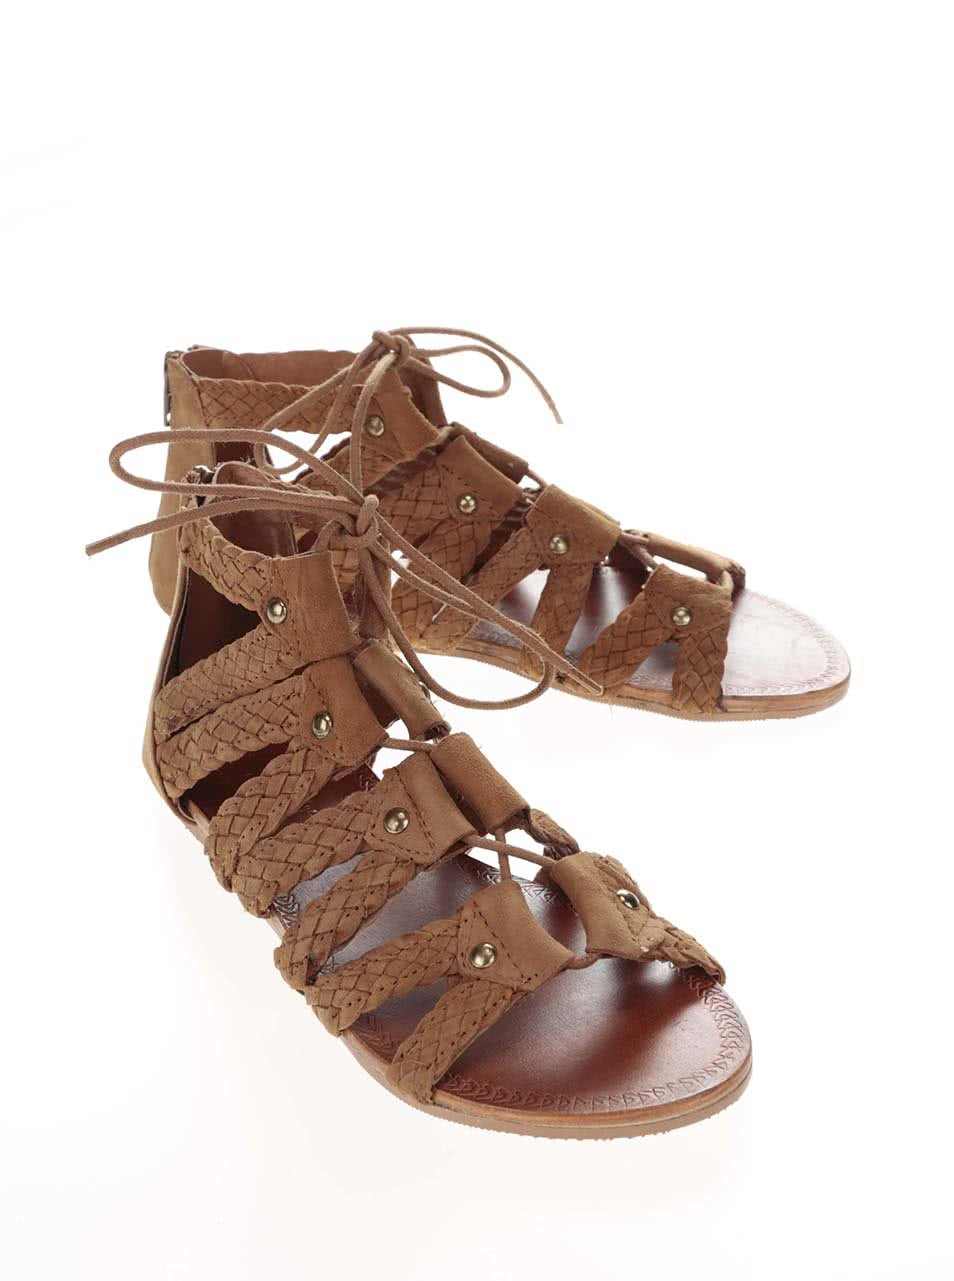 6d3e8561084d Hnedé semišové šnurovacie sandále Miss Selfridge ...